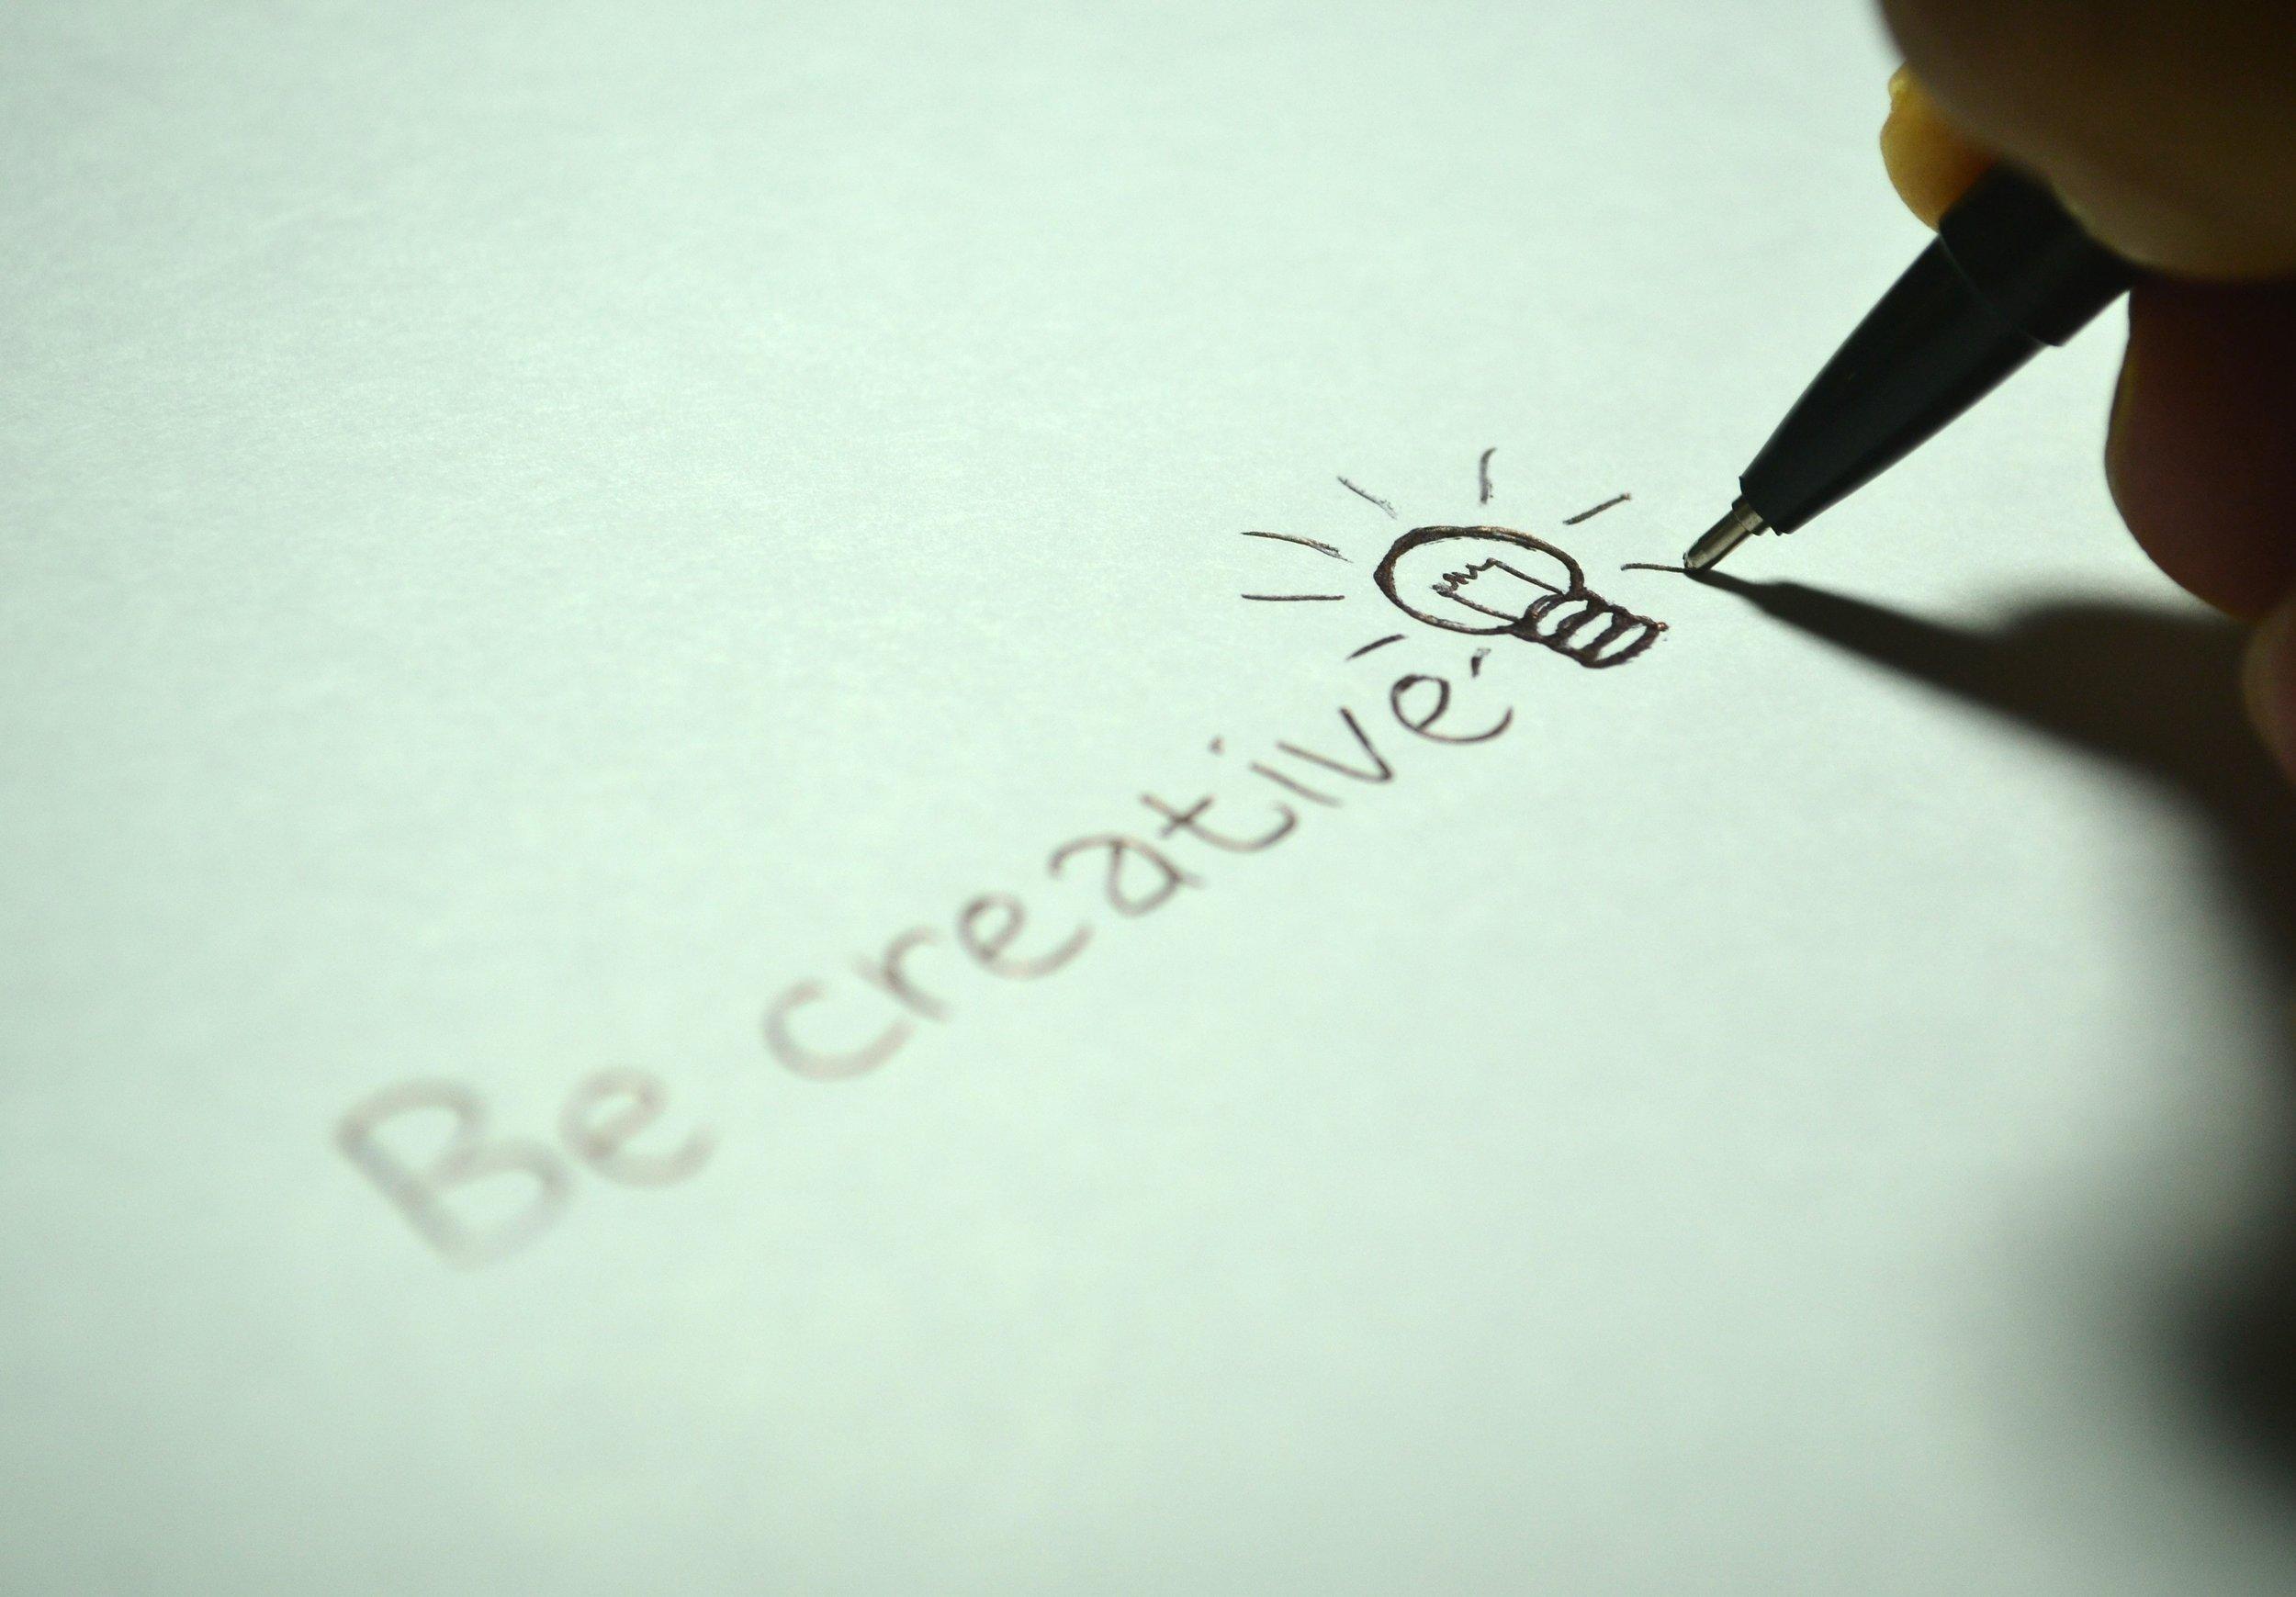 be-creative-creative-creativity-256514.jpg